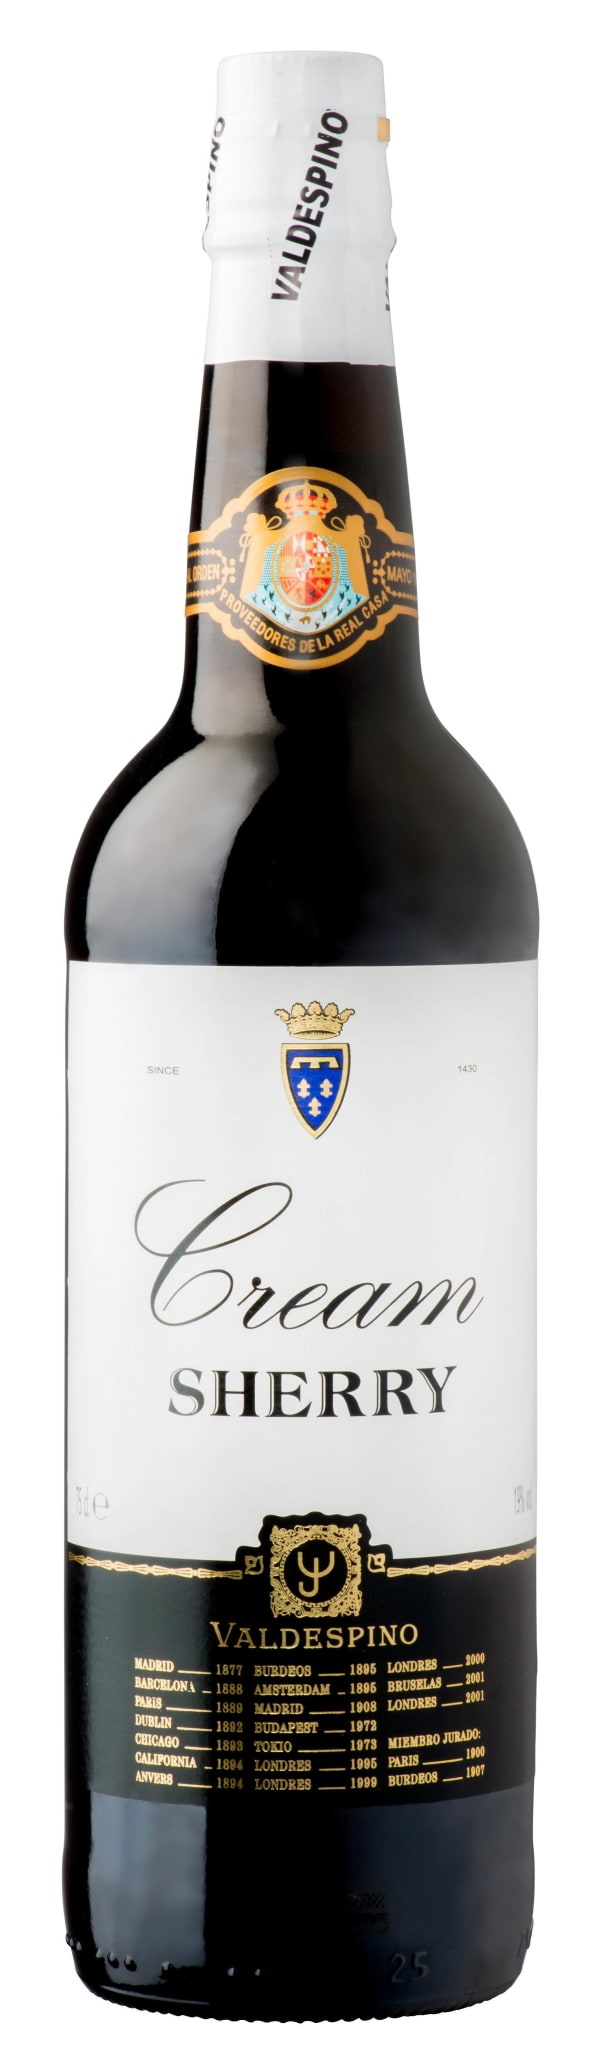 Valdespino Cream Sherry